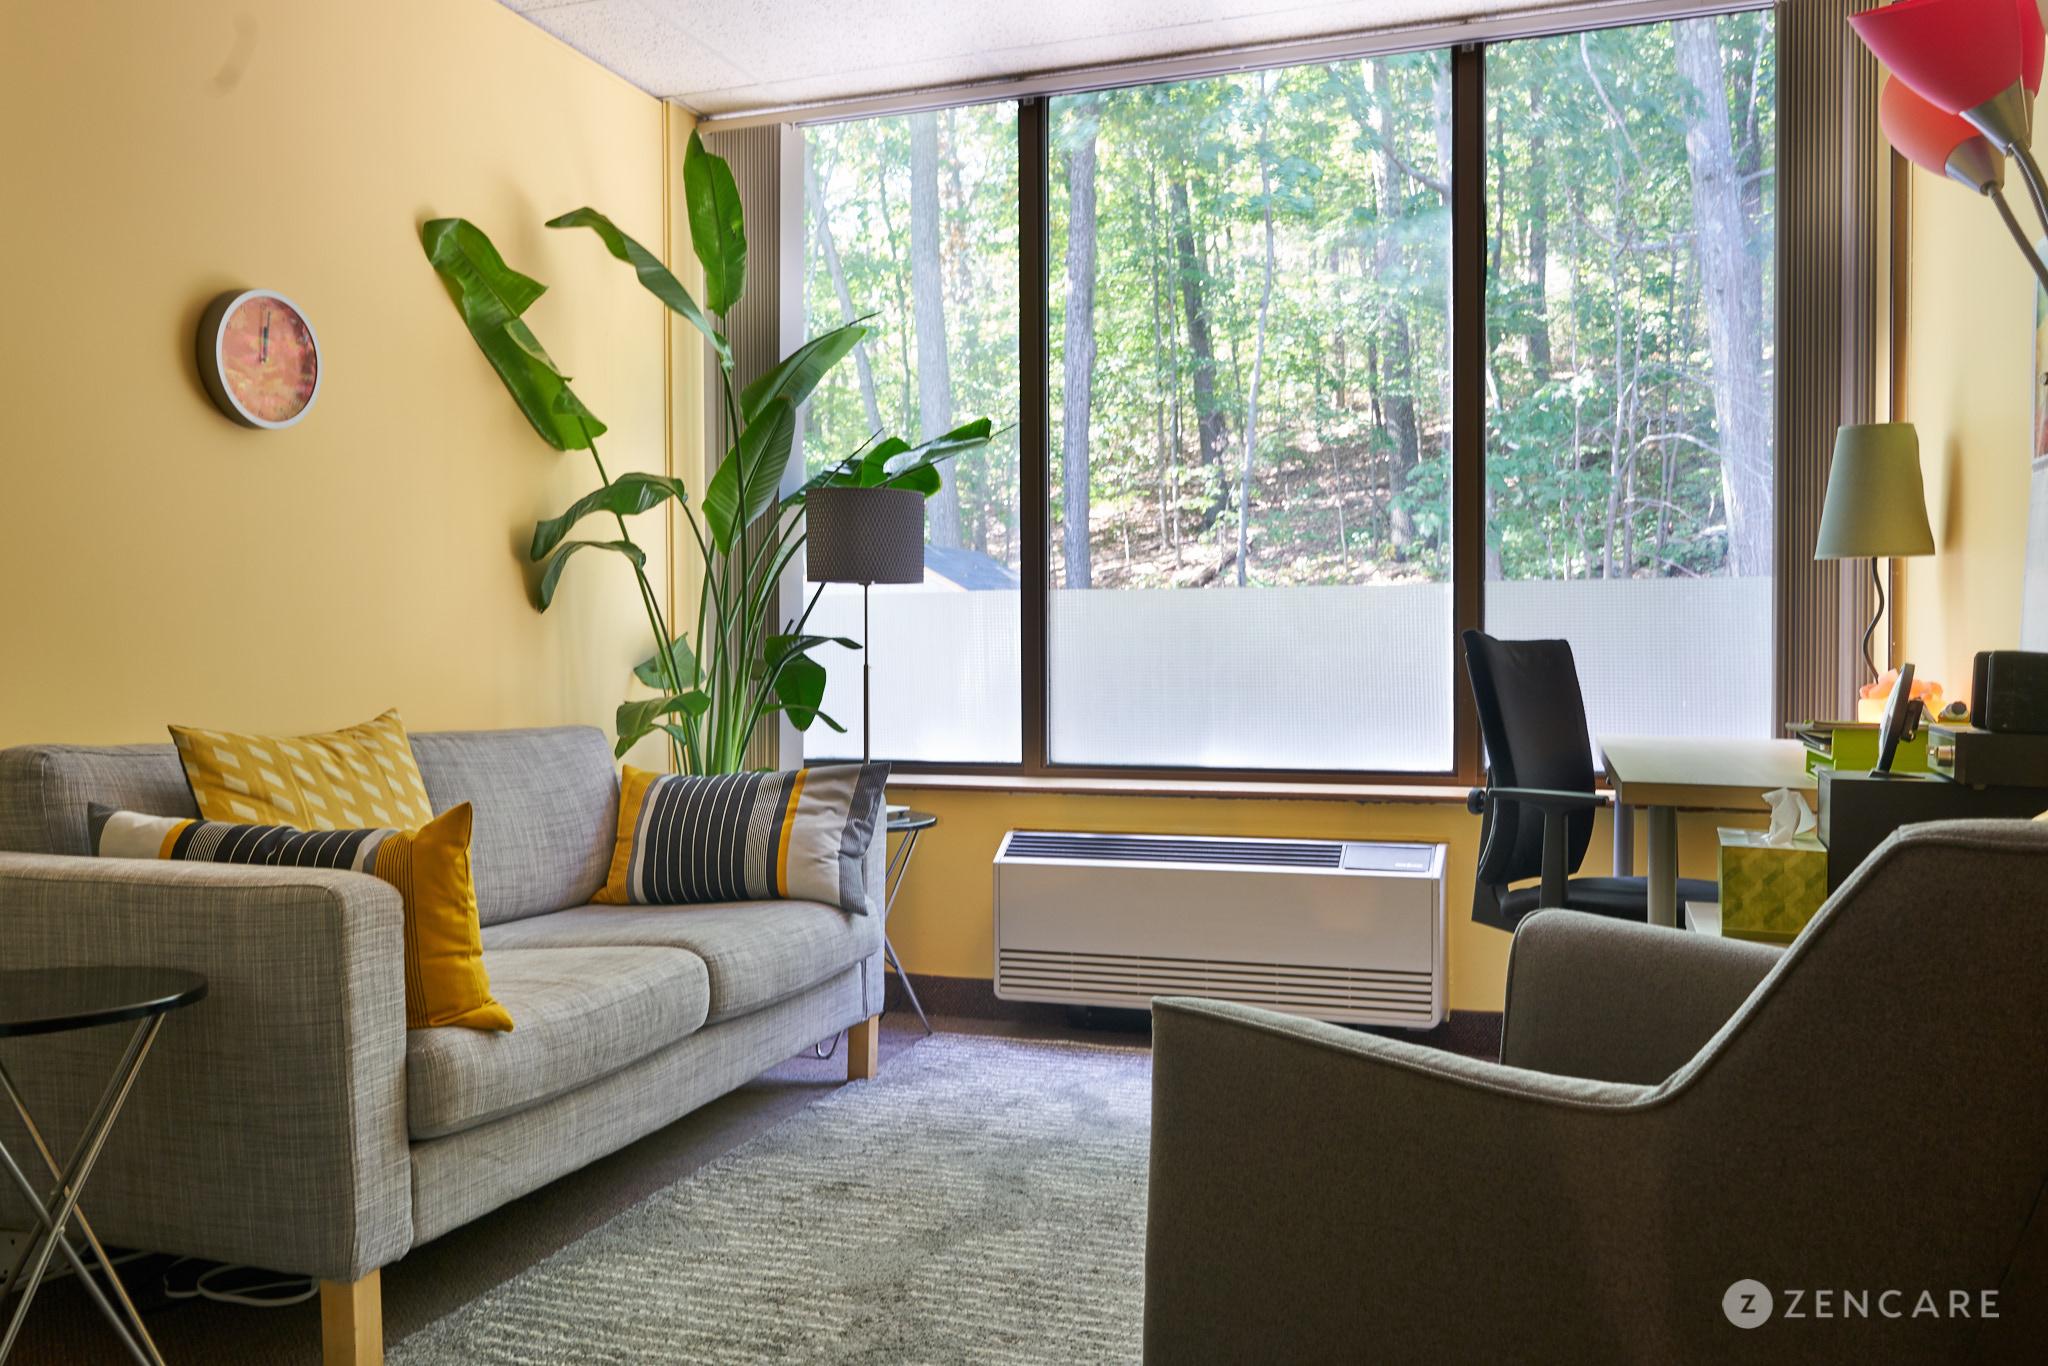 Dana Oshiro LICSW - Therapist in Lexington MA - 8.jpg